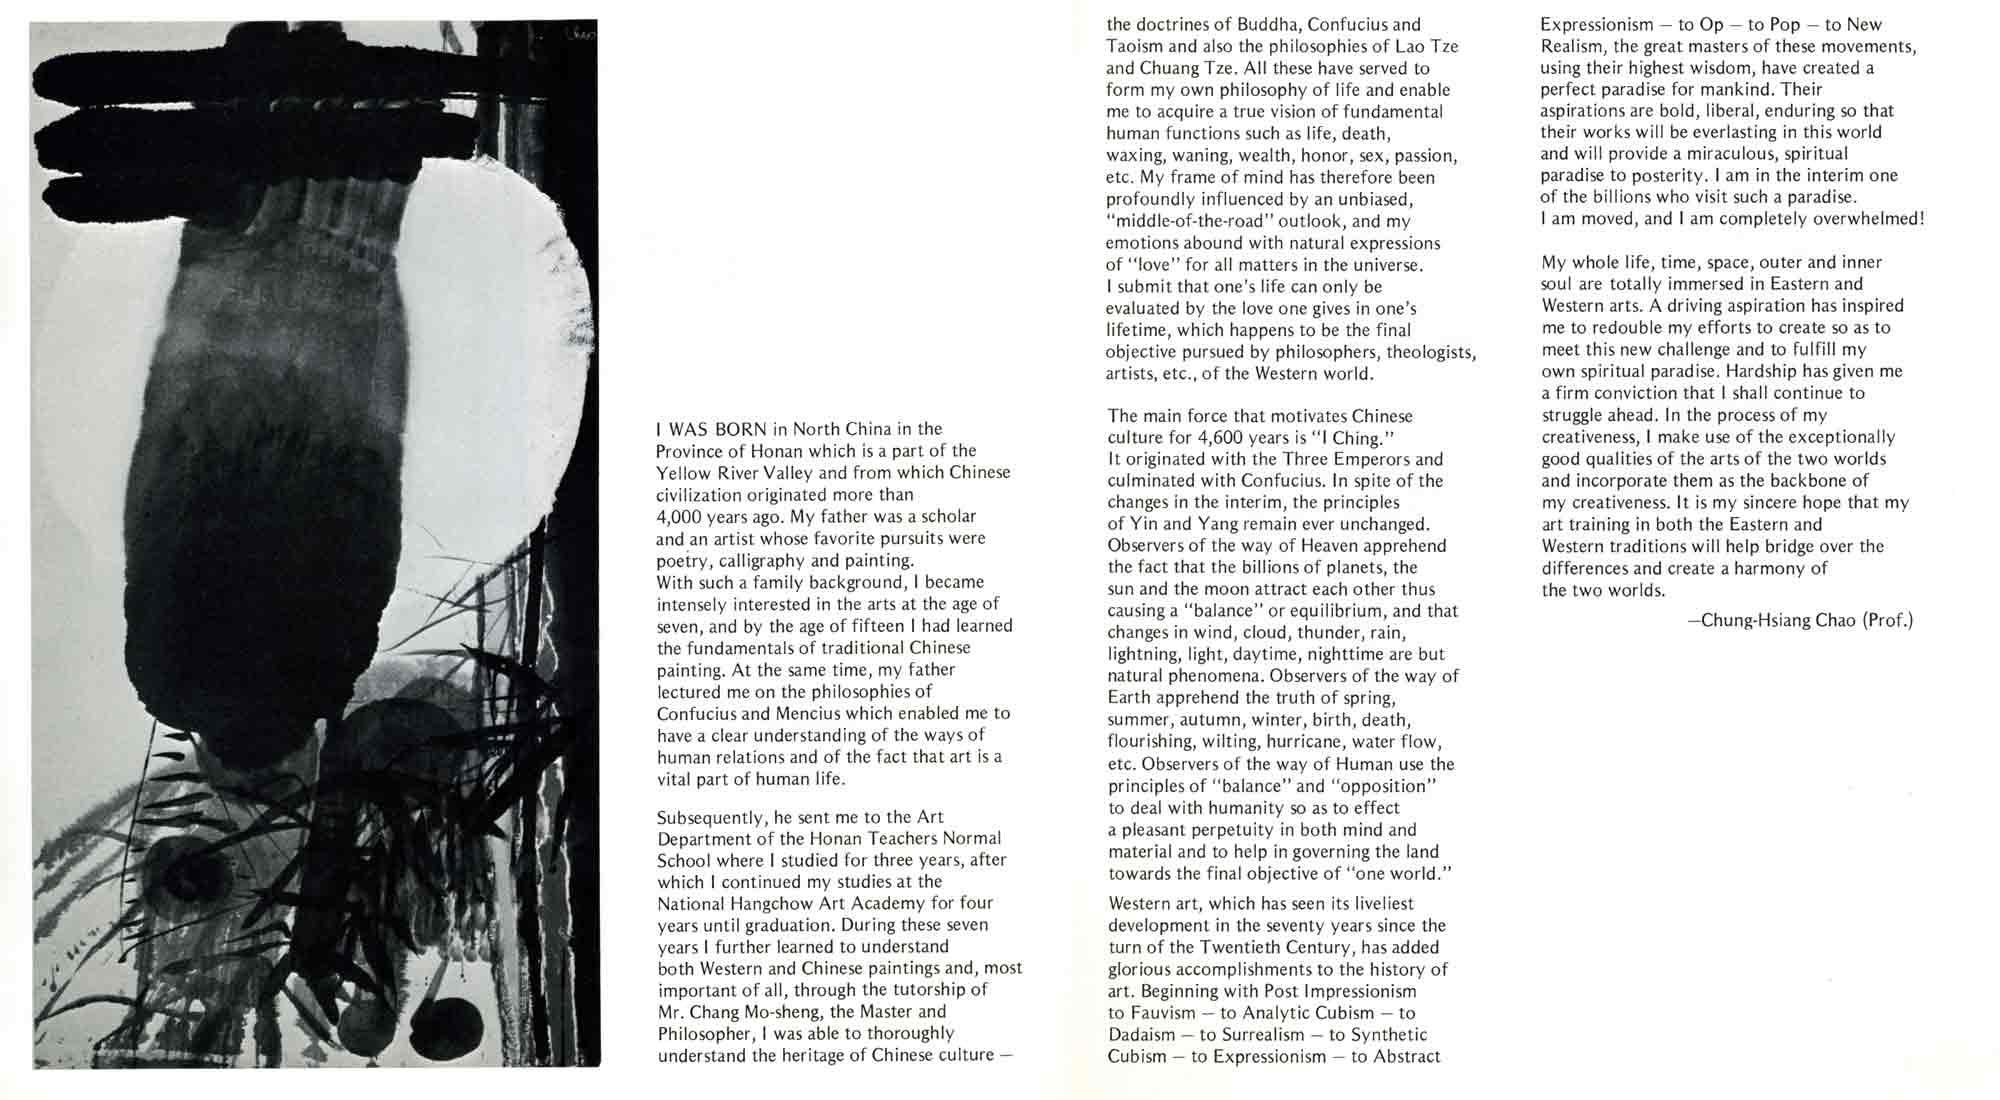 Chung-Hsiang Chao: Life Ripening Into Fullness, brochure, pg 2